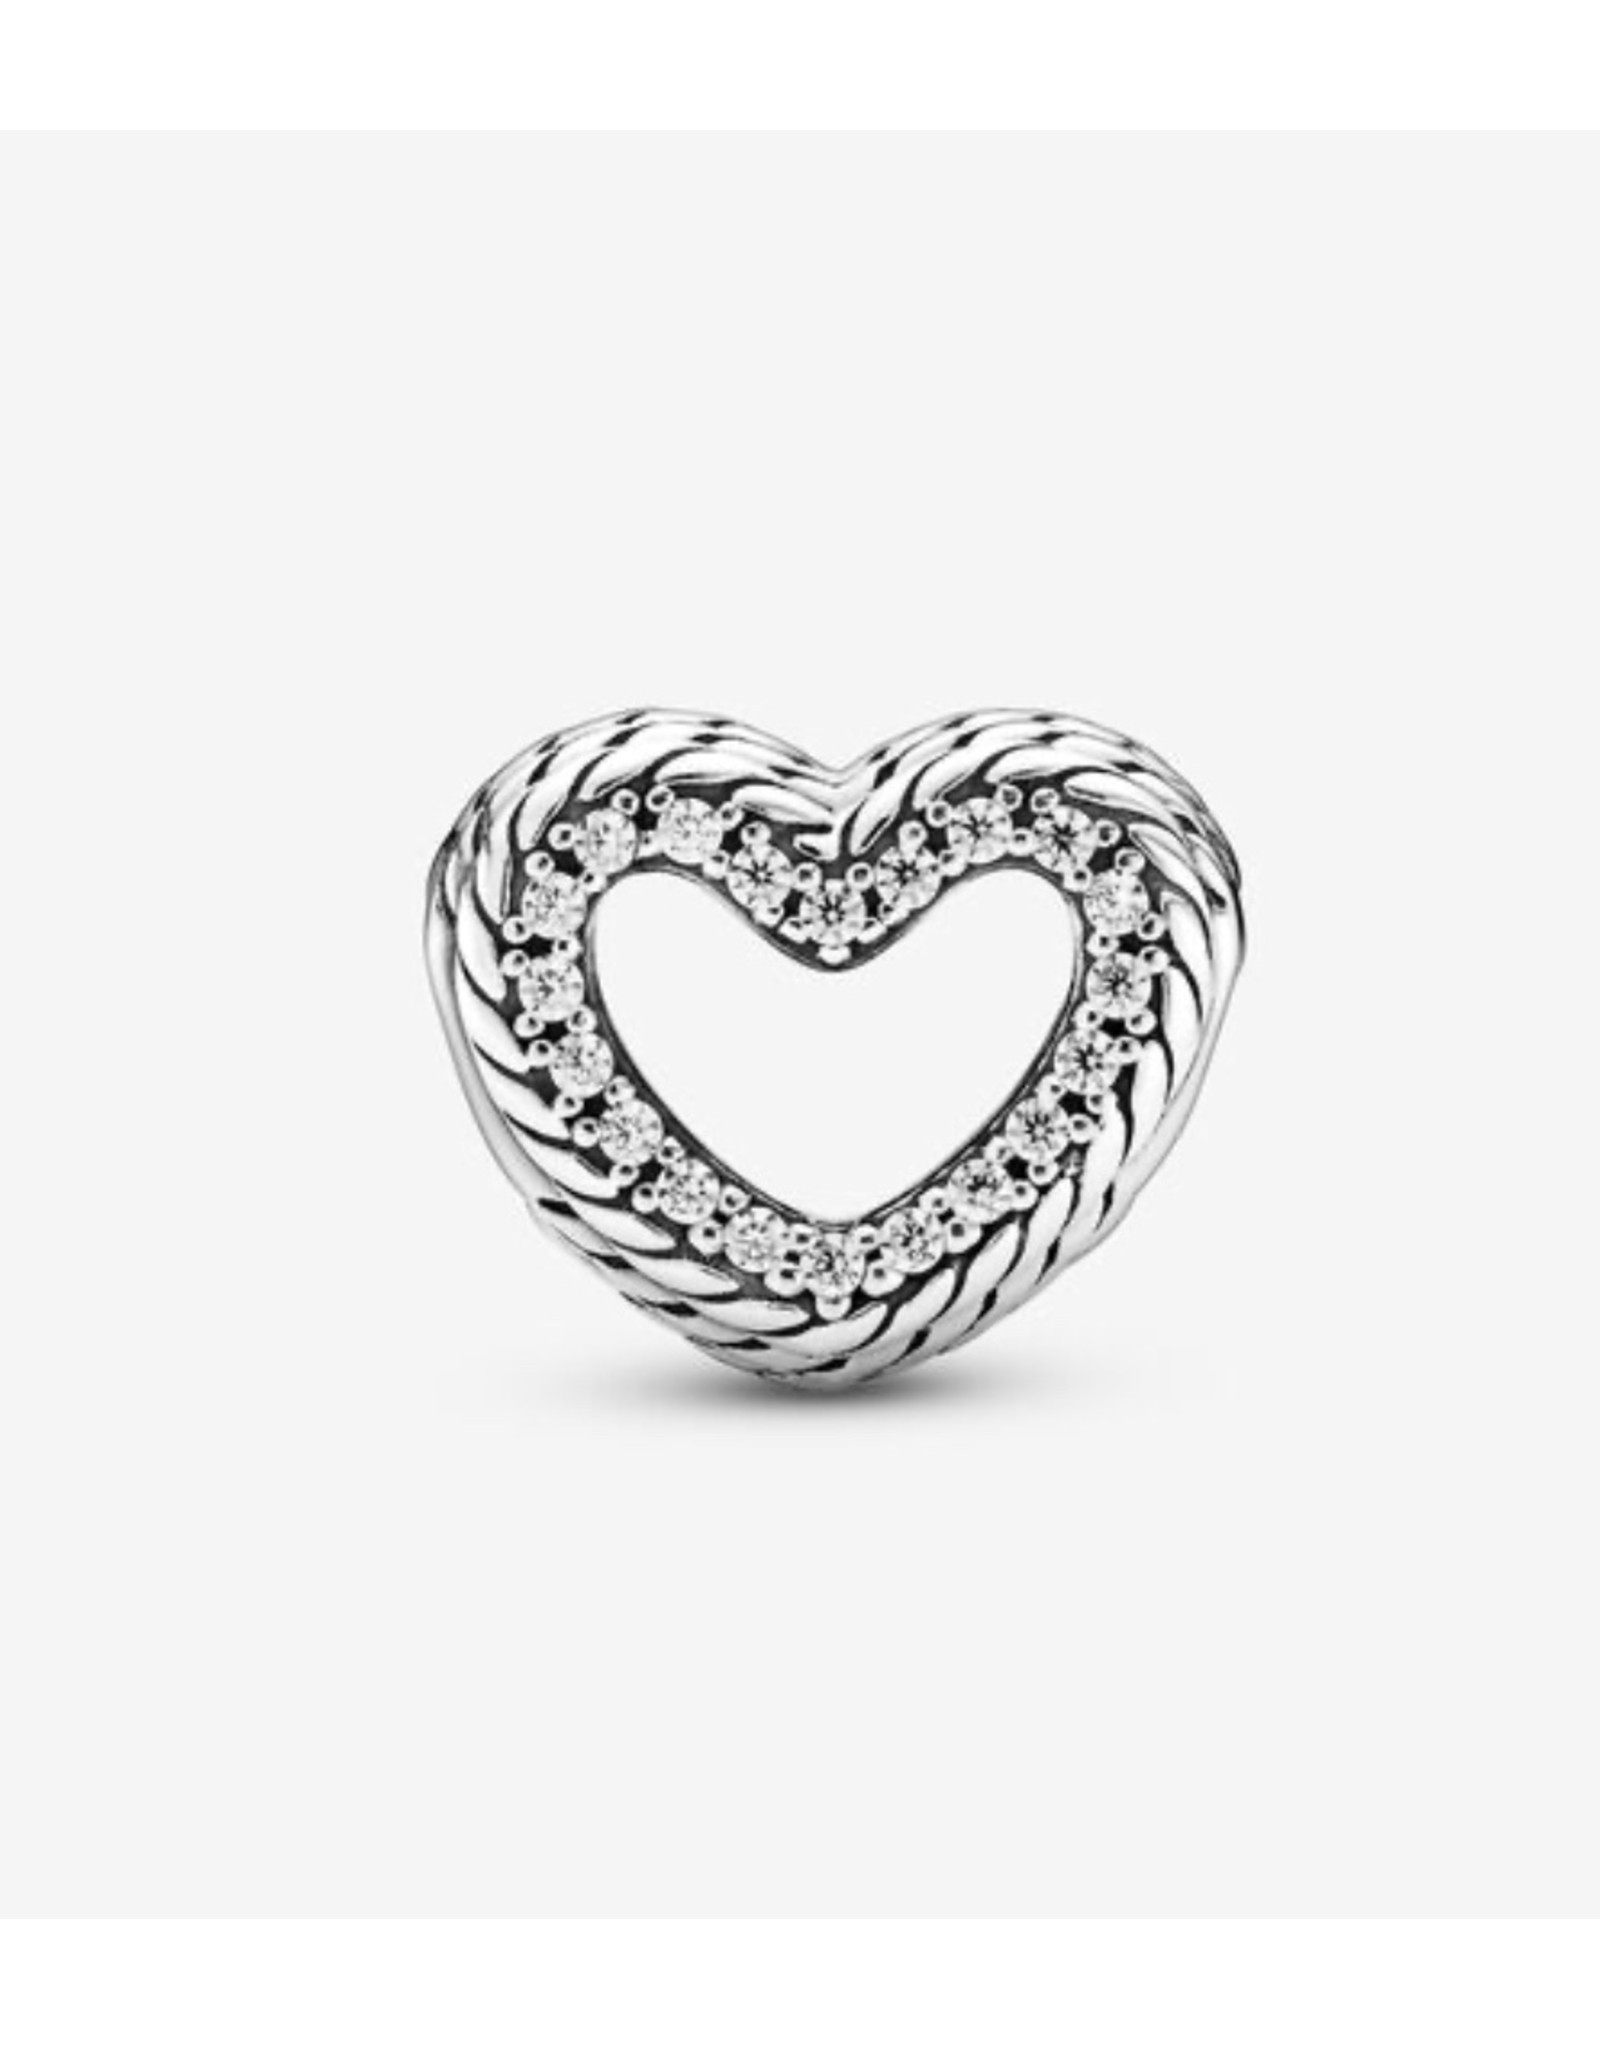 Pandora Pandora Charm,799100C01, Snake Chain Pattern Open Heart, Sterling Silver,Clear CZ